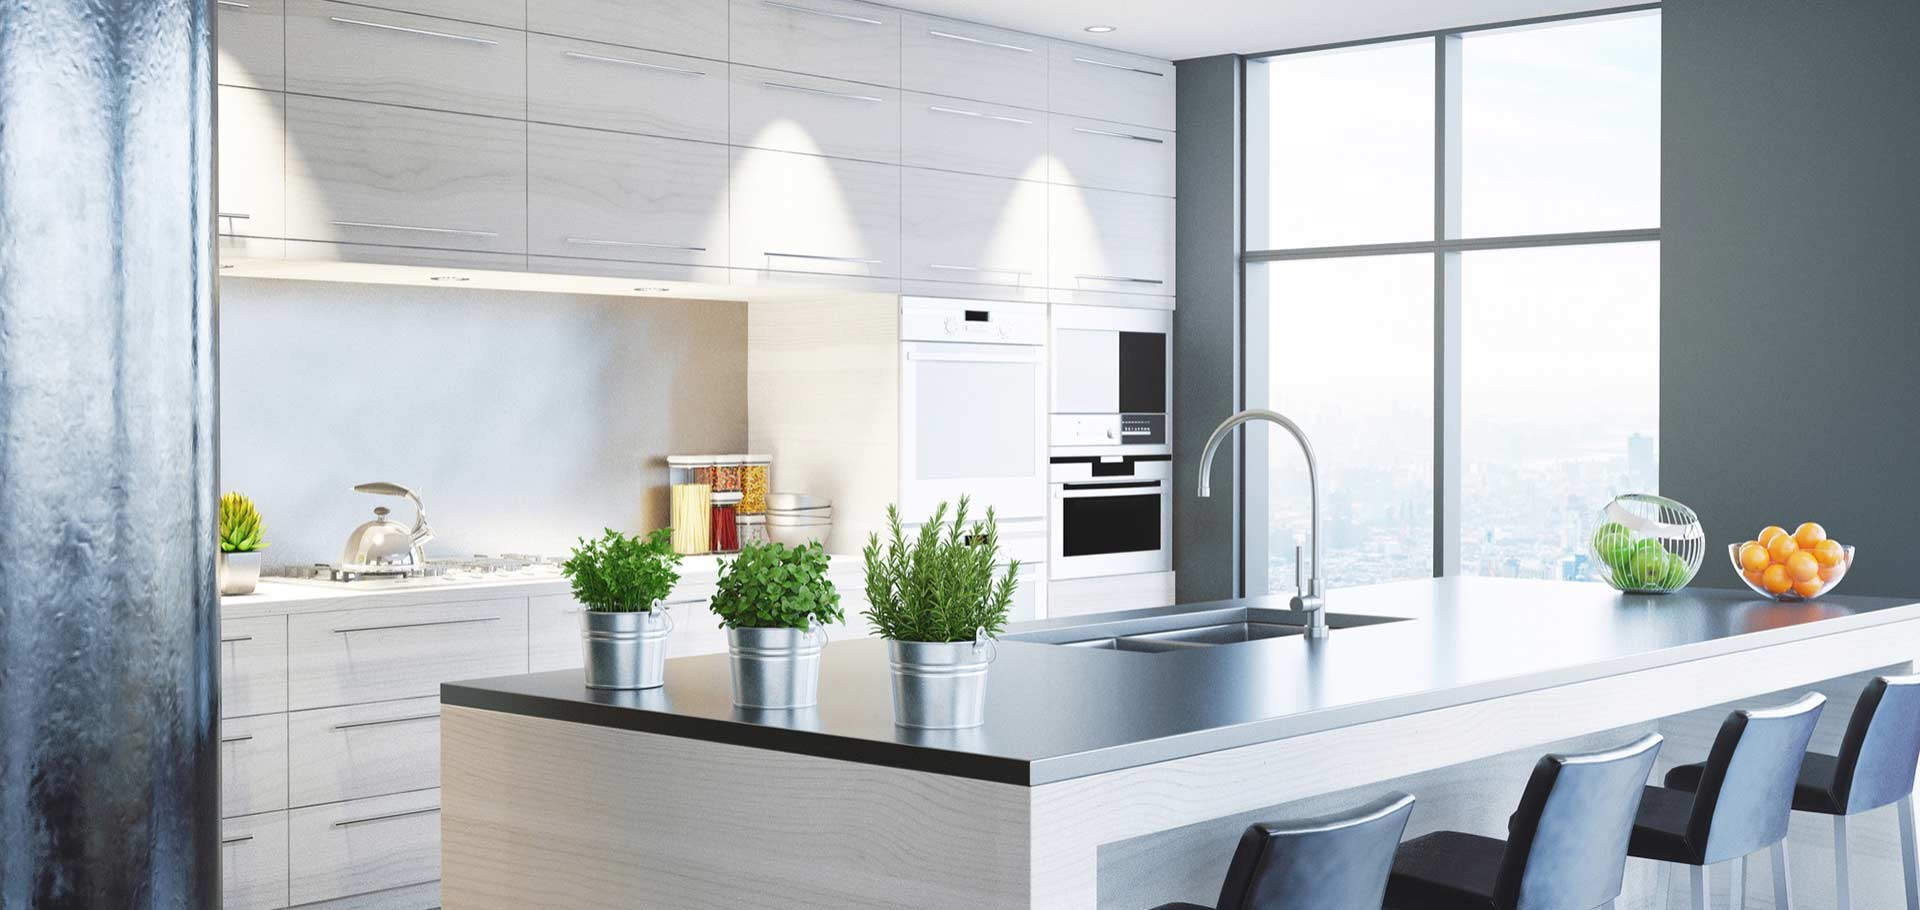 Cuisine moderne avec fenêtres